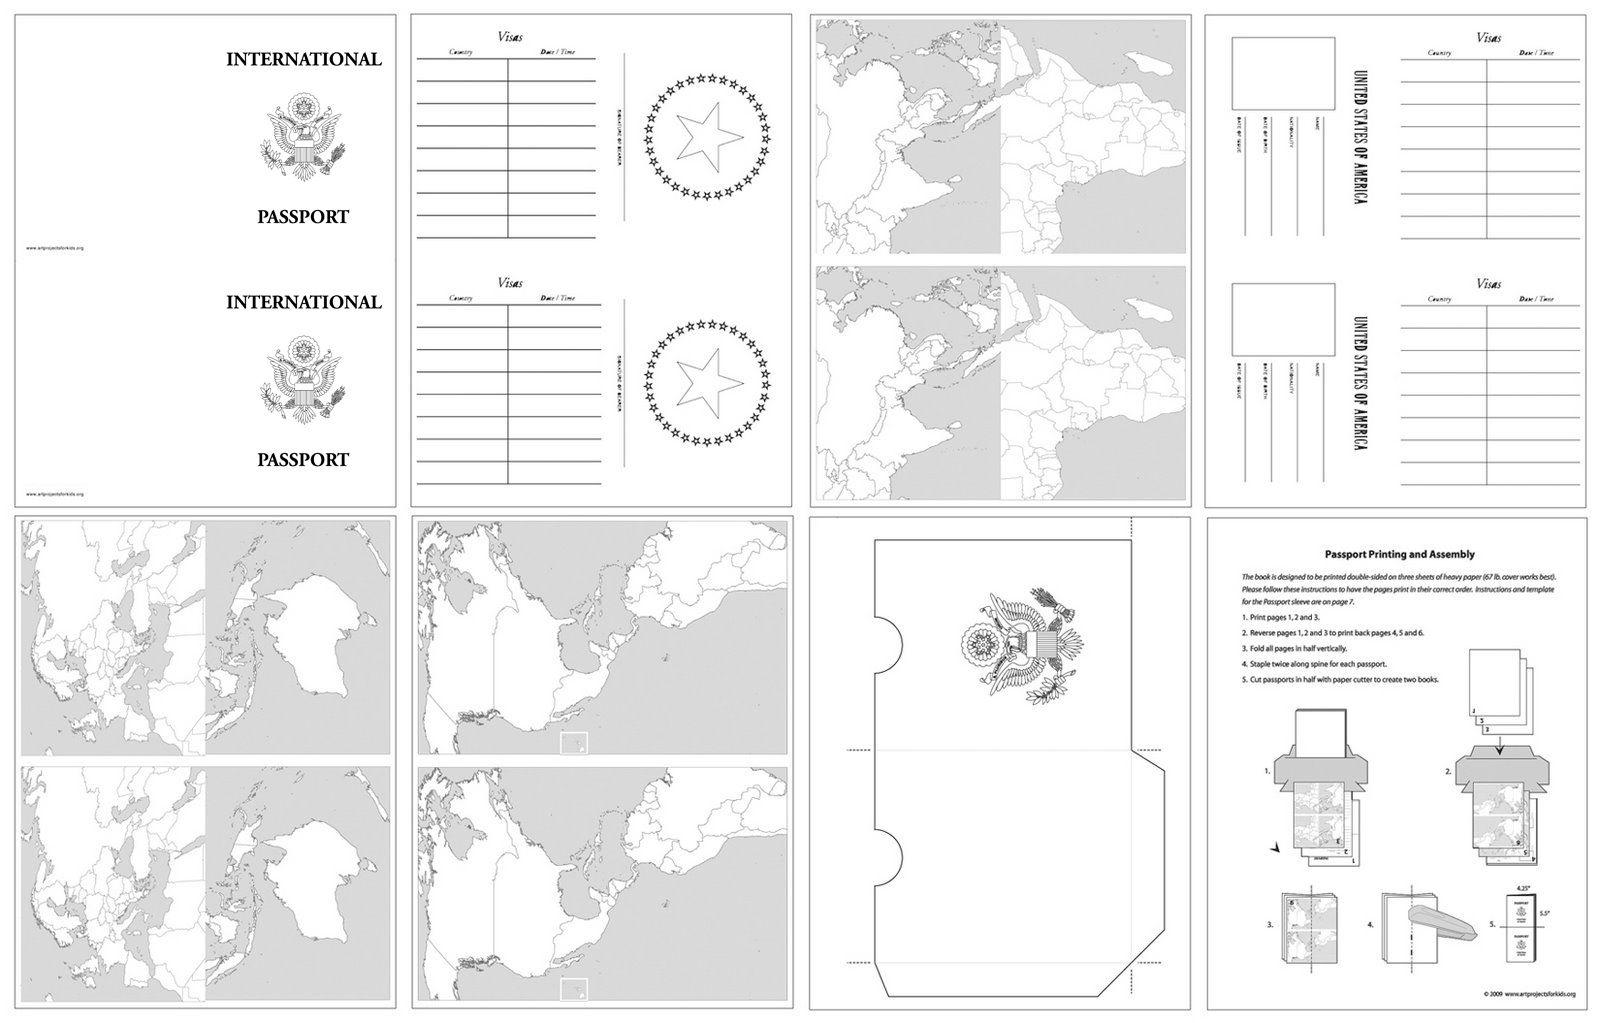 Passport Template For Kids |  Printable Passport Design Paper For - Free Printable Passport Template